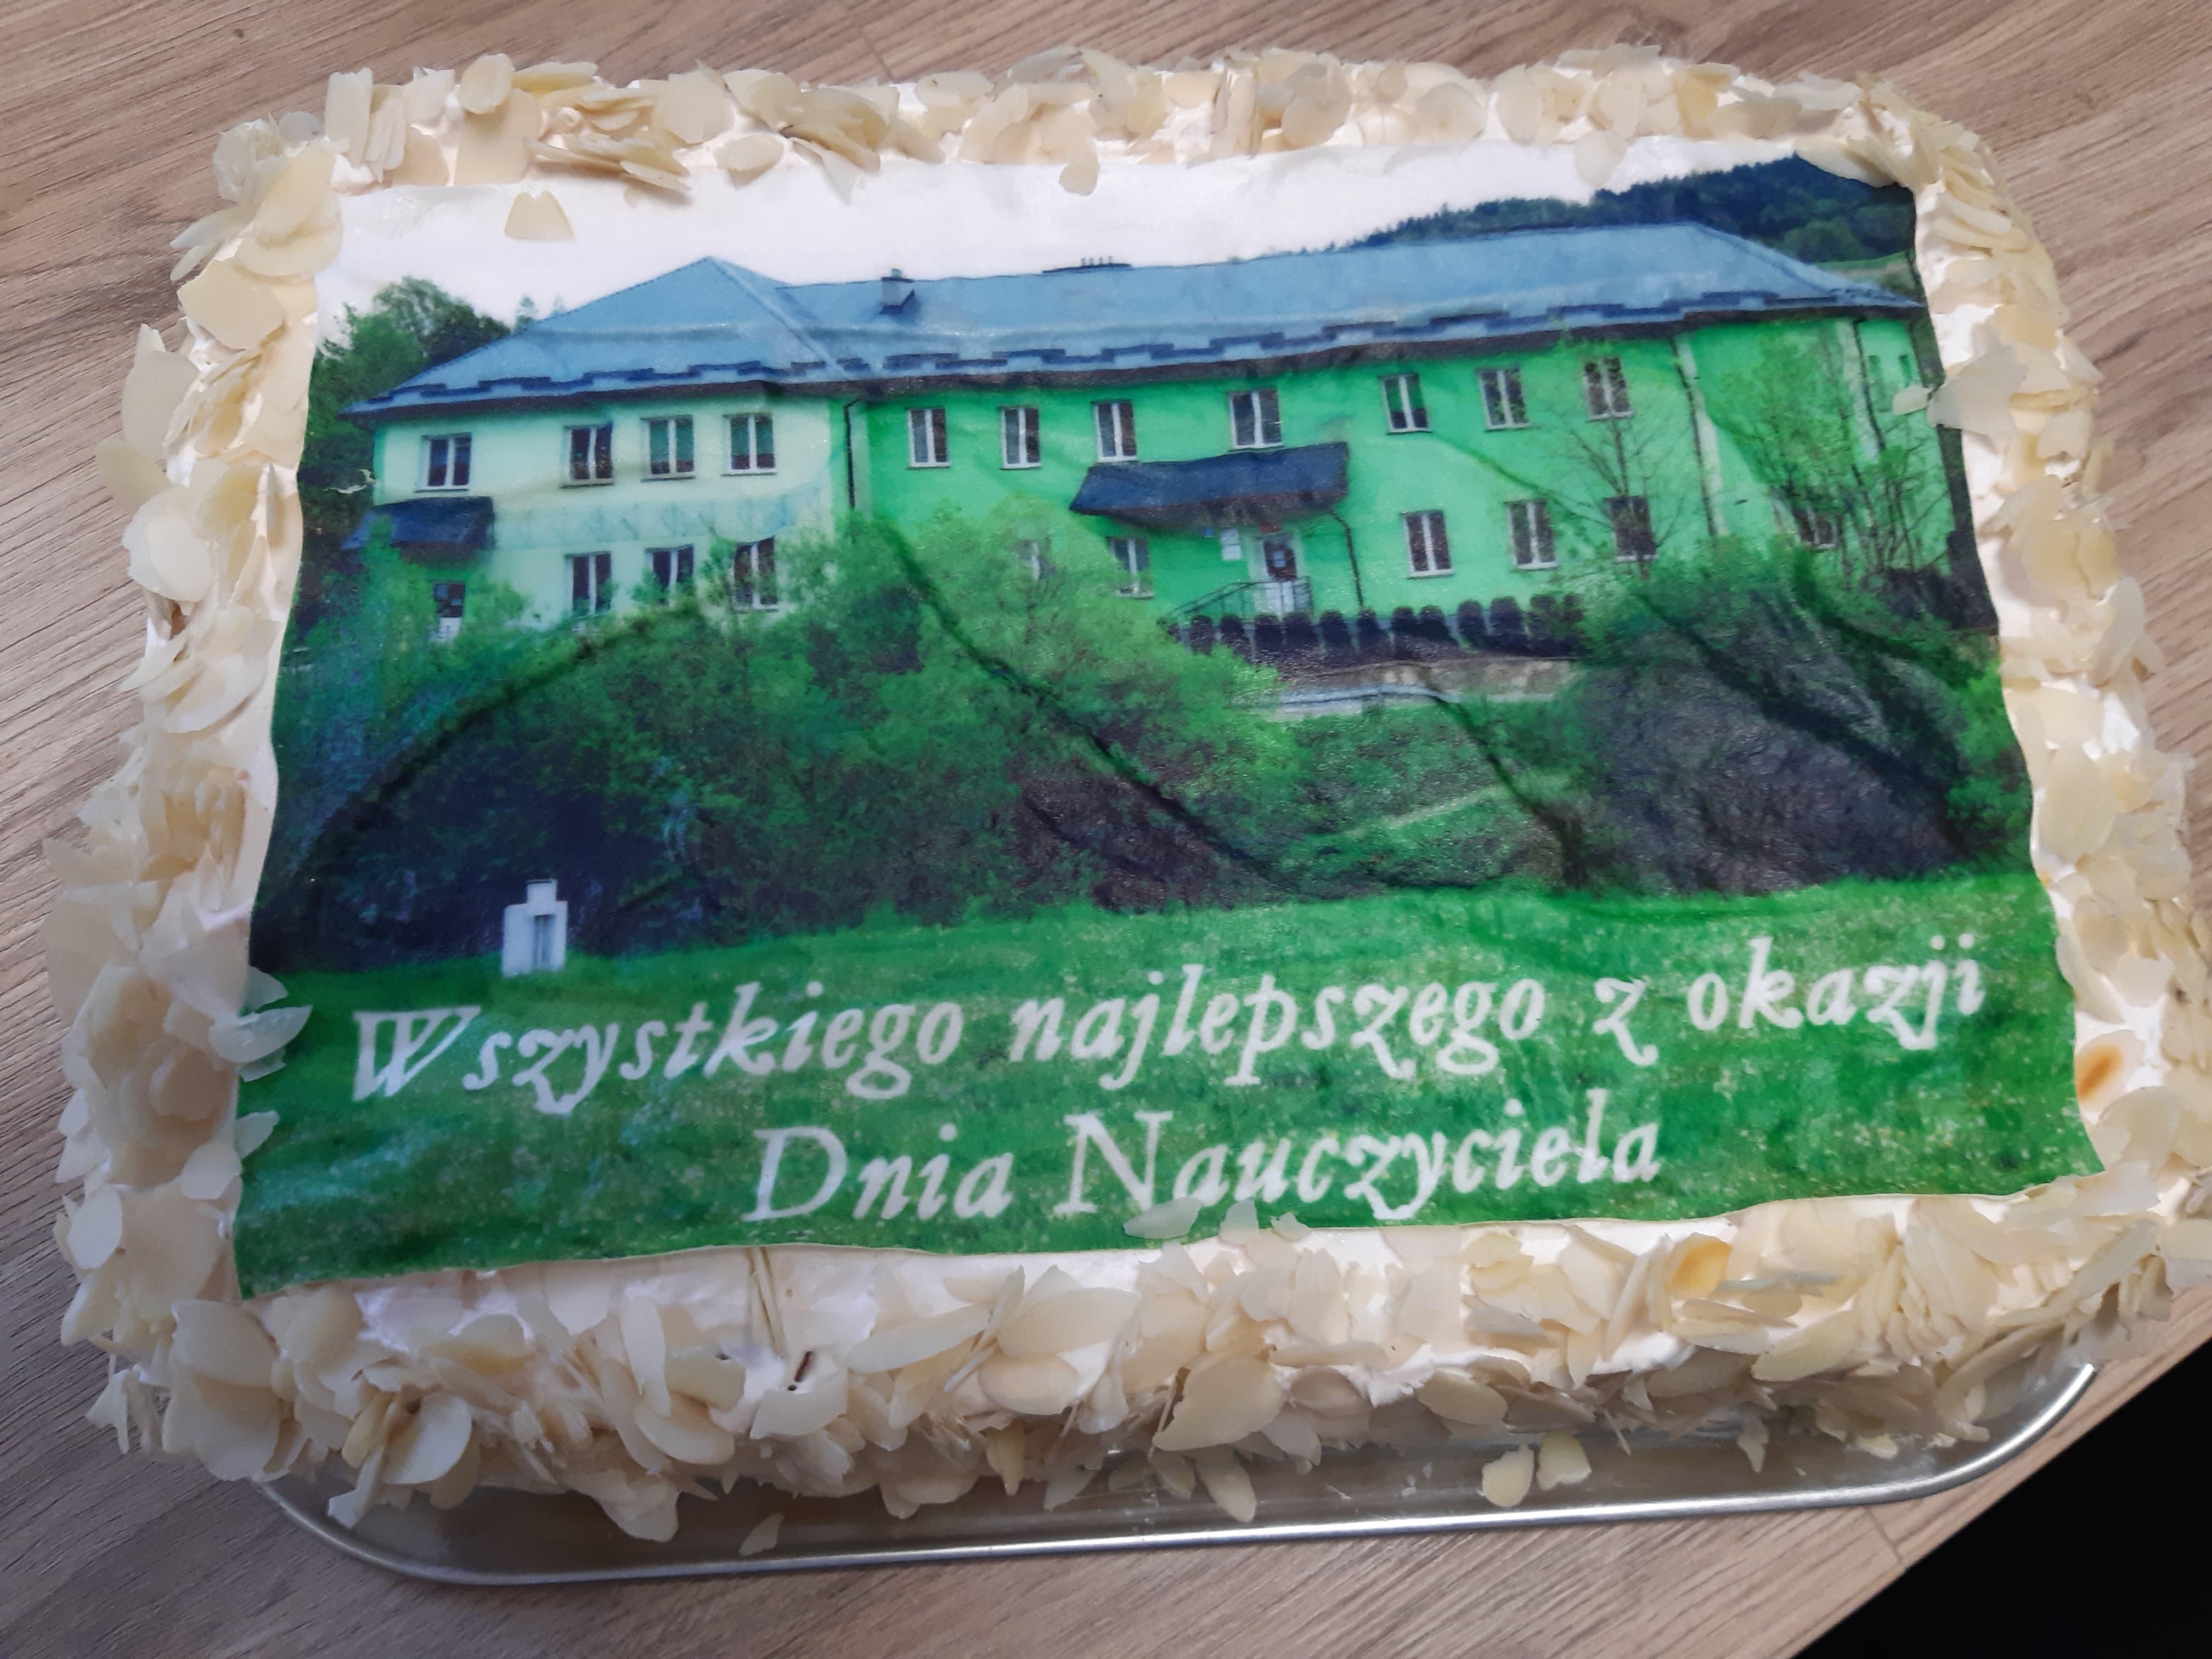 Tort tak piękny, że aż żal kroić:)